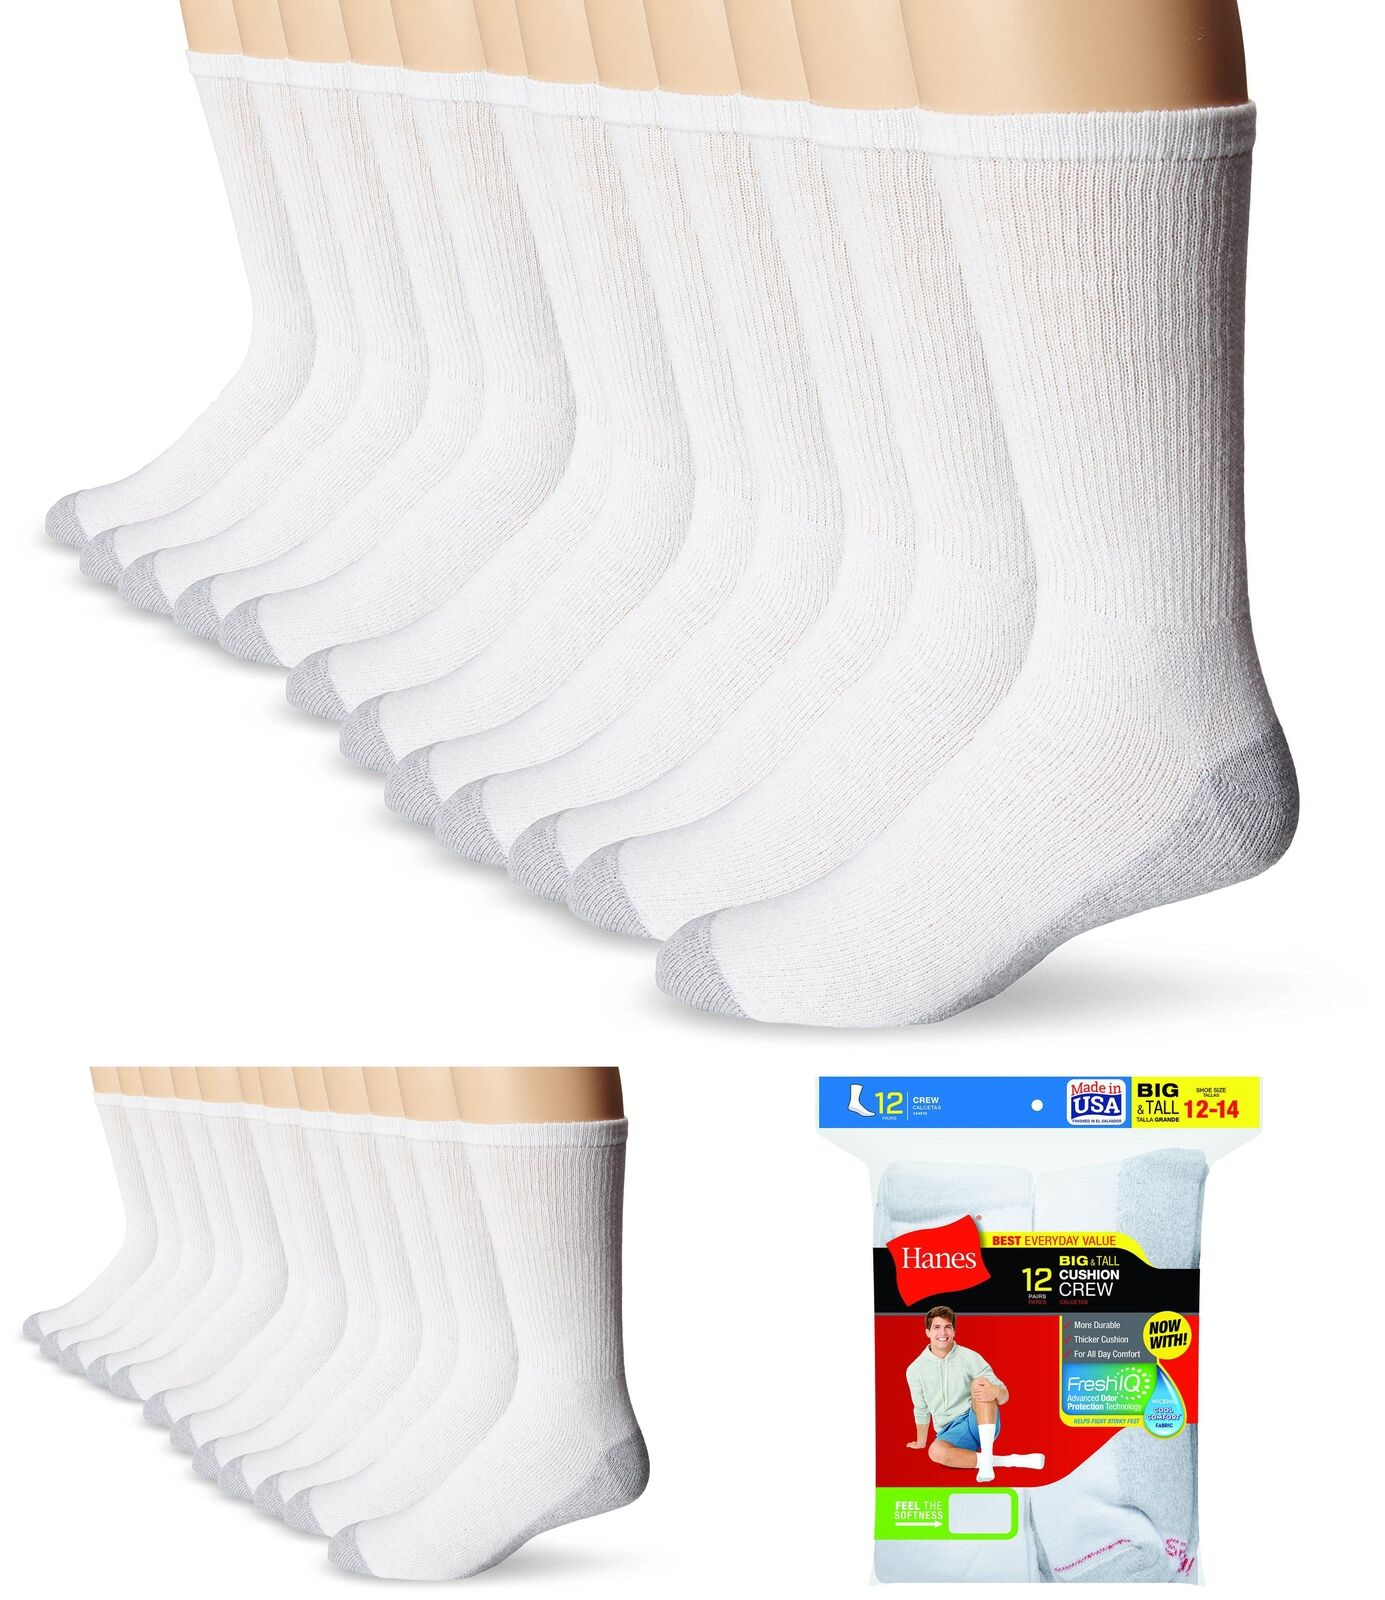 Hanes Men/'s Crew Socks Pack of 12 Cushion Comfort Cotton Fresh IQ size 6-12 NWT